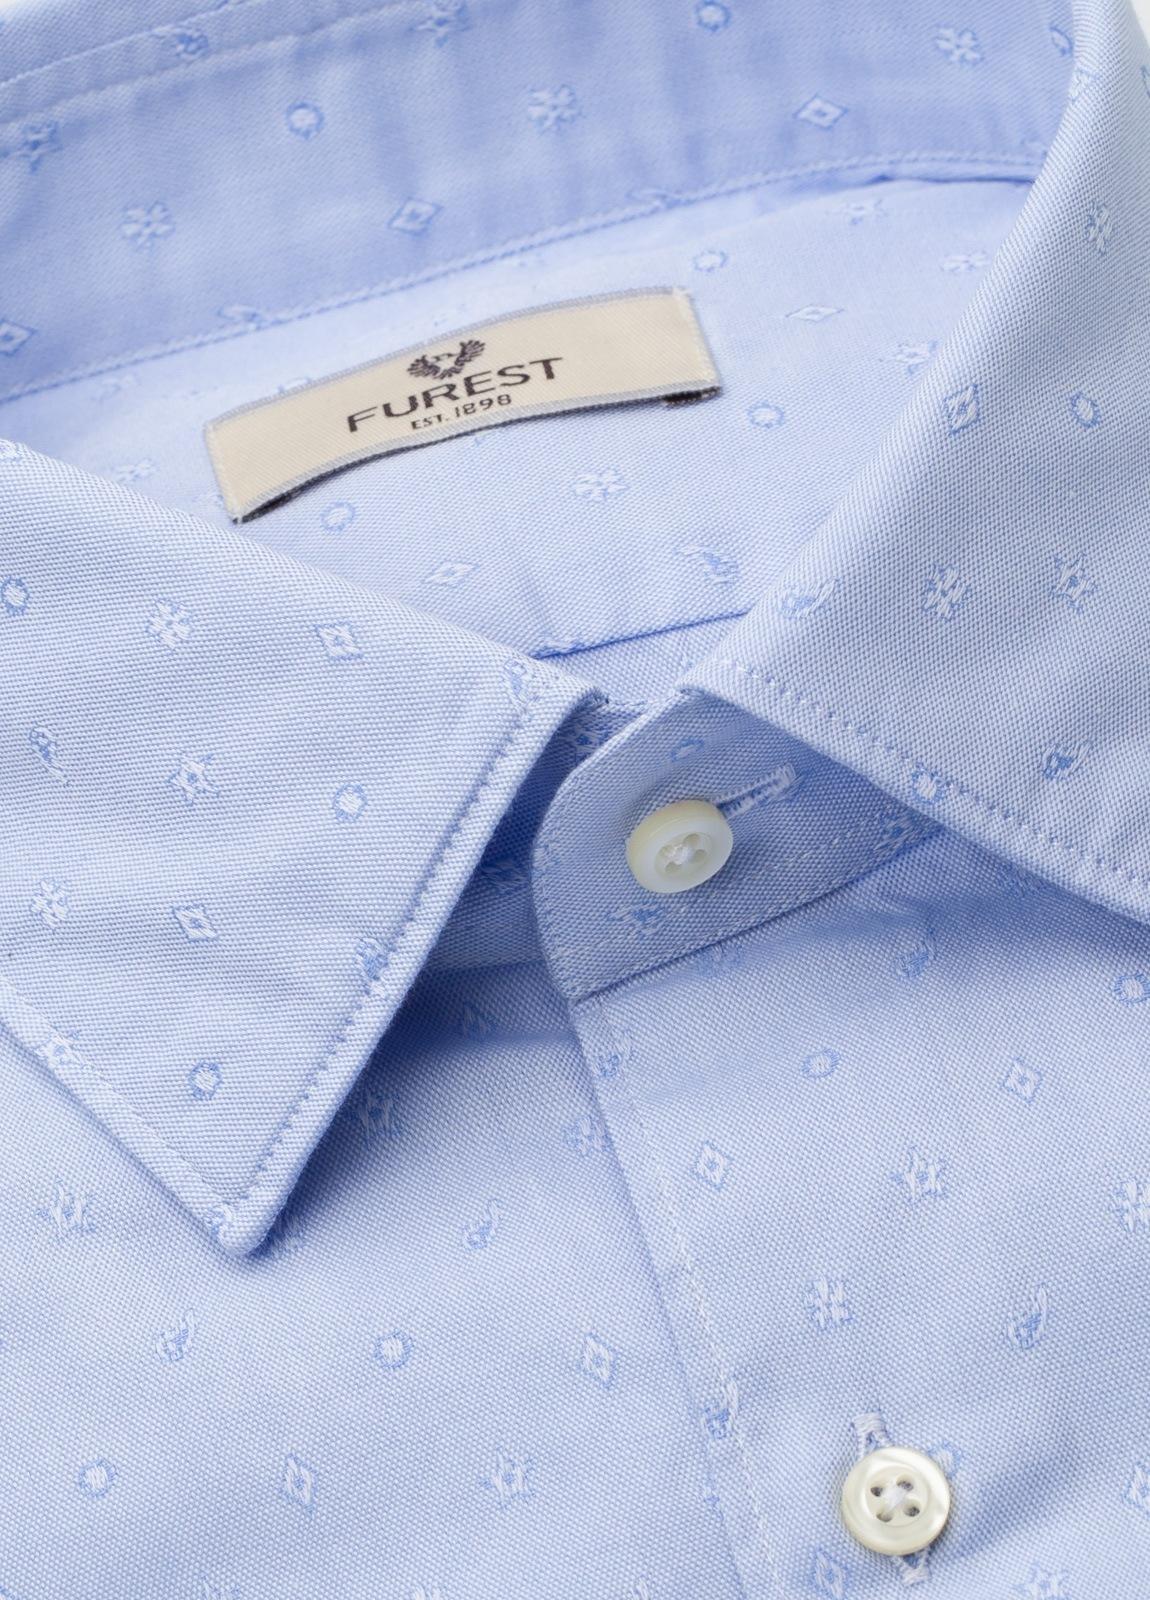 Camisa Leisure Wear REGULAR FIT modelo PORTO tejido dibujo jacquard color celeste. 100% Algodón. - Ítem1